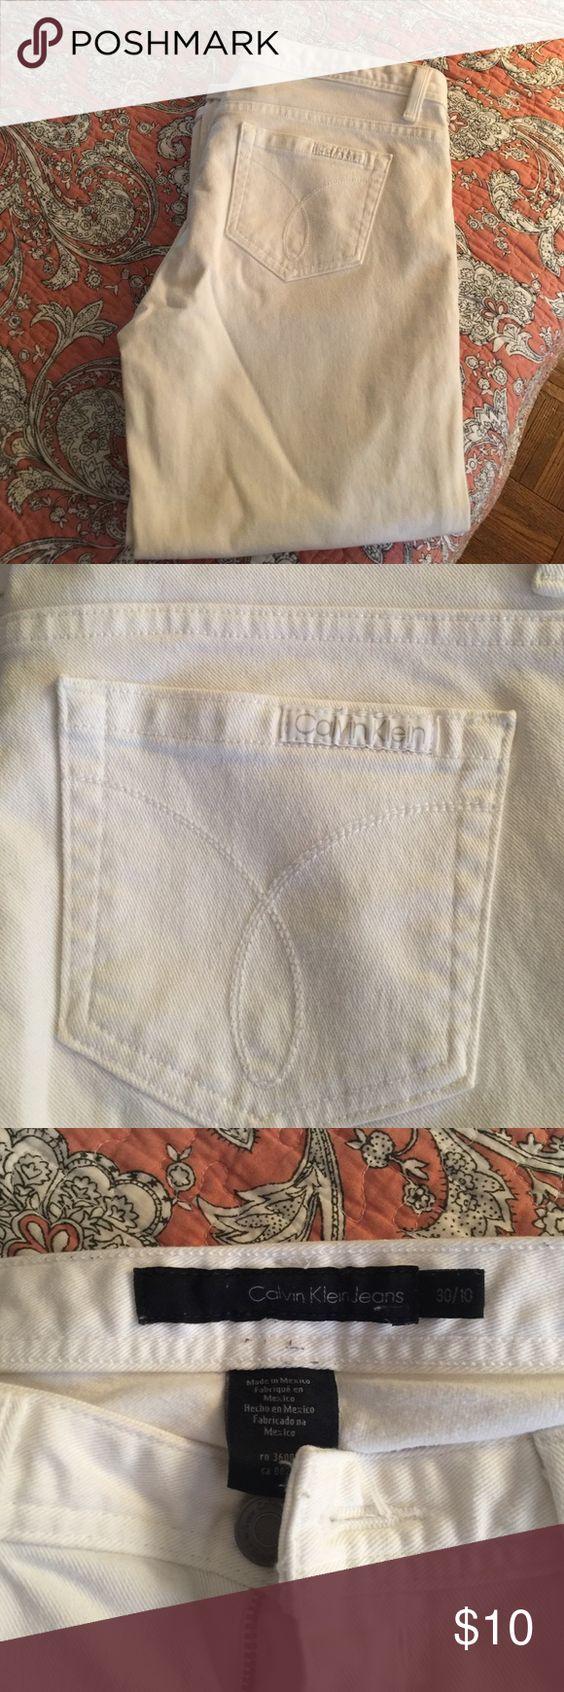 Calvin Klein White Jean Capris Calvin Klein White Jean Capris, great condition, size 30/10 Calvin Klein Pants Capris